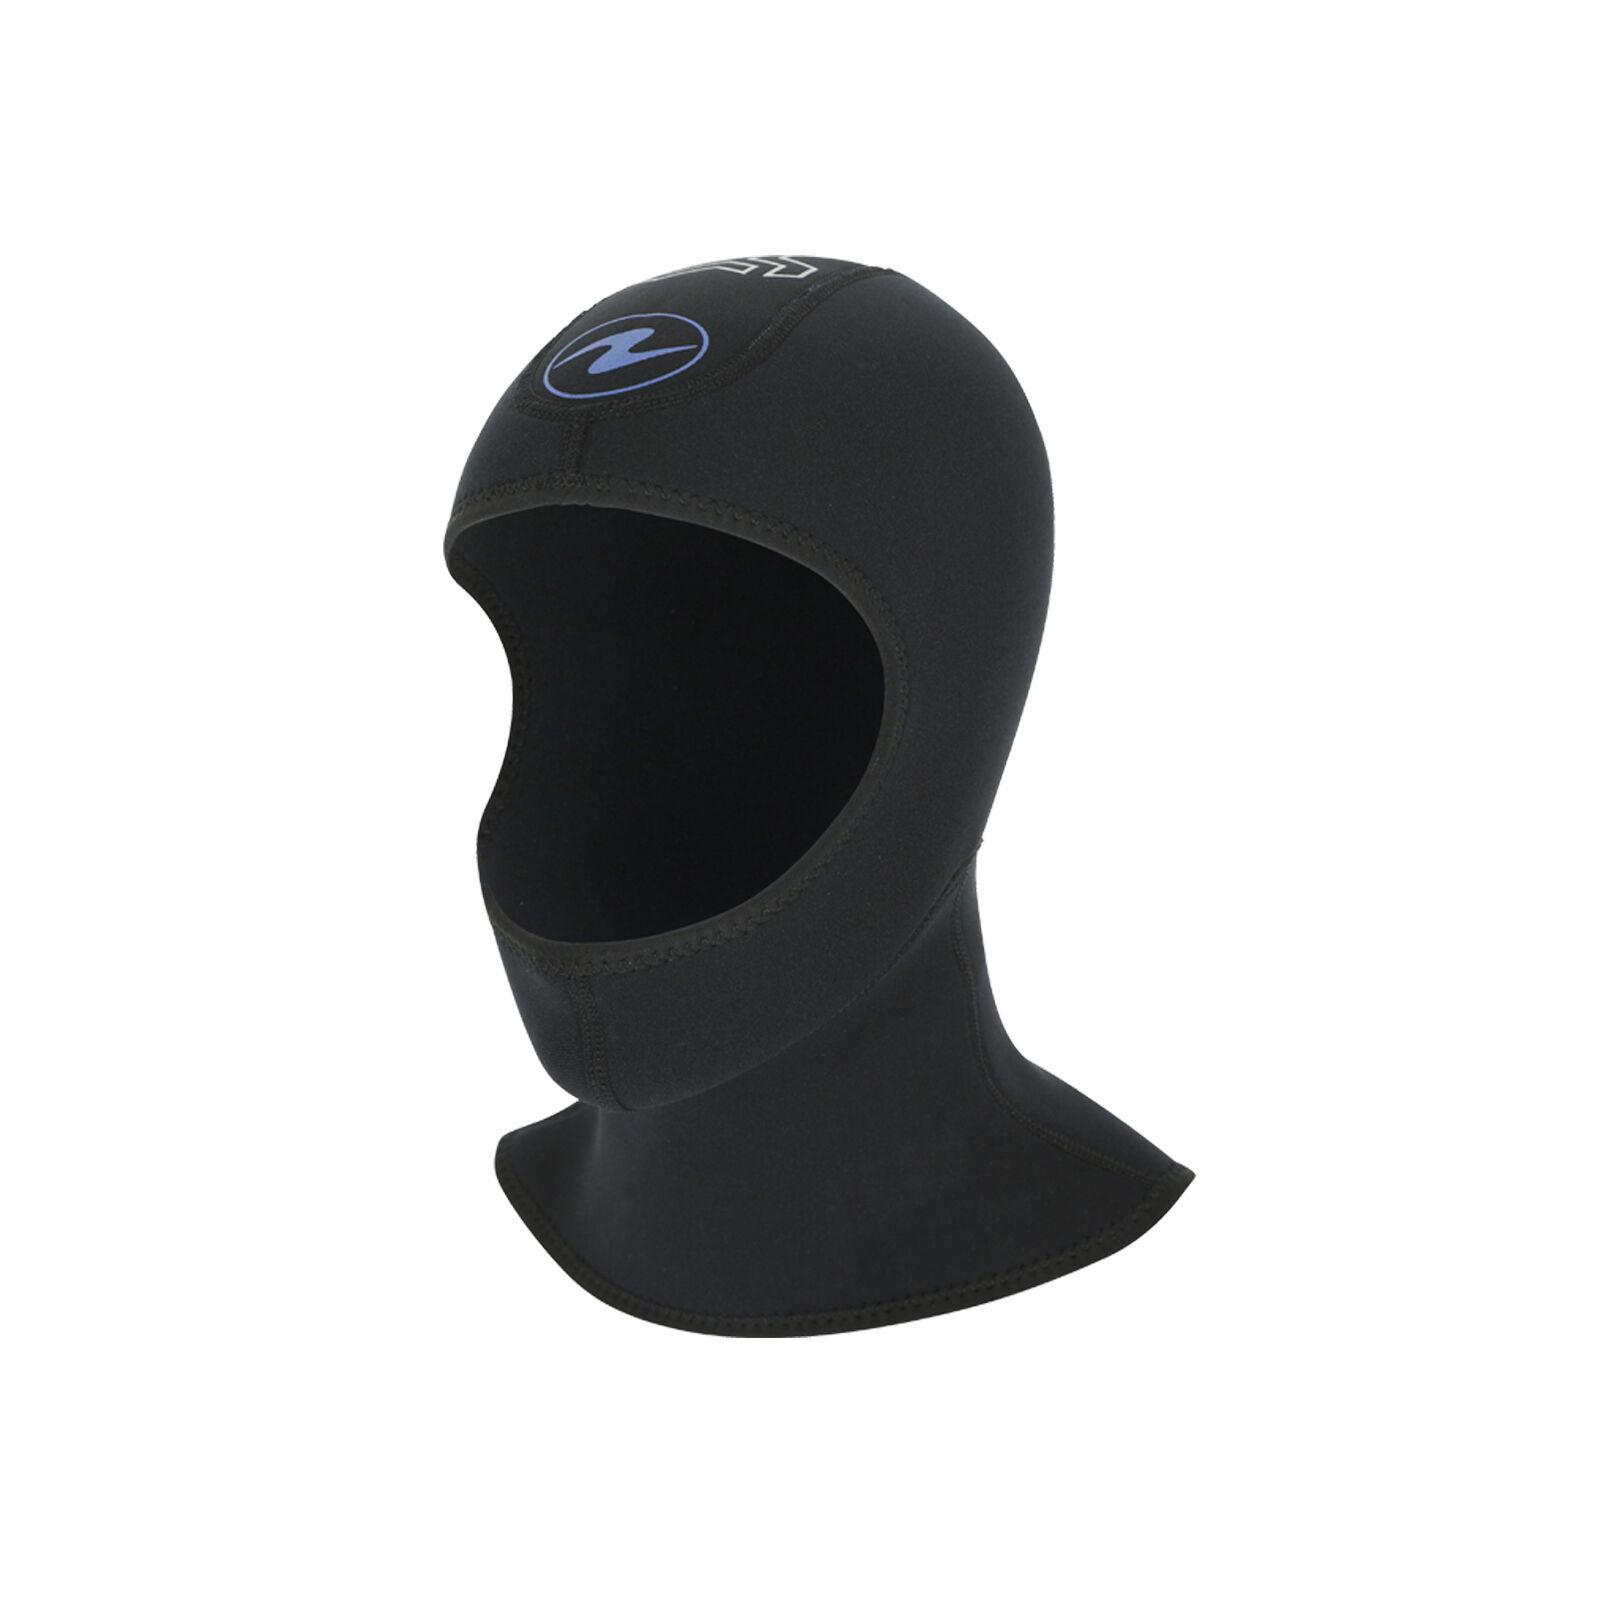 AquaLung Balance Comfort 5,5 5,5 5,5 mm Kopfhaube für Herren 701e7c